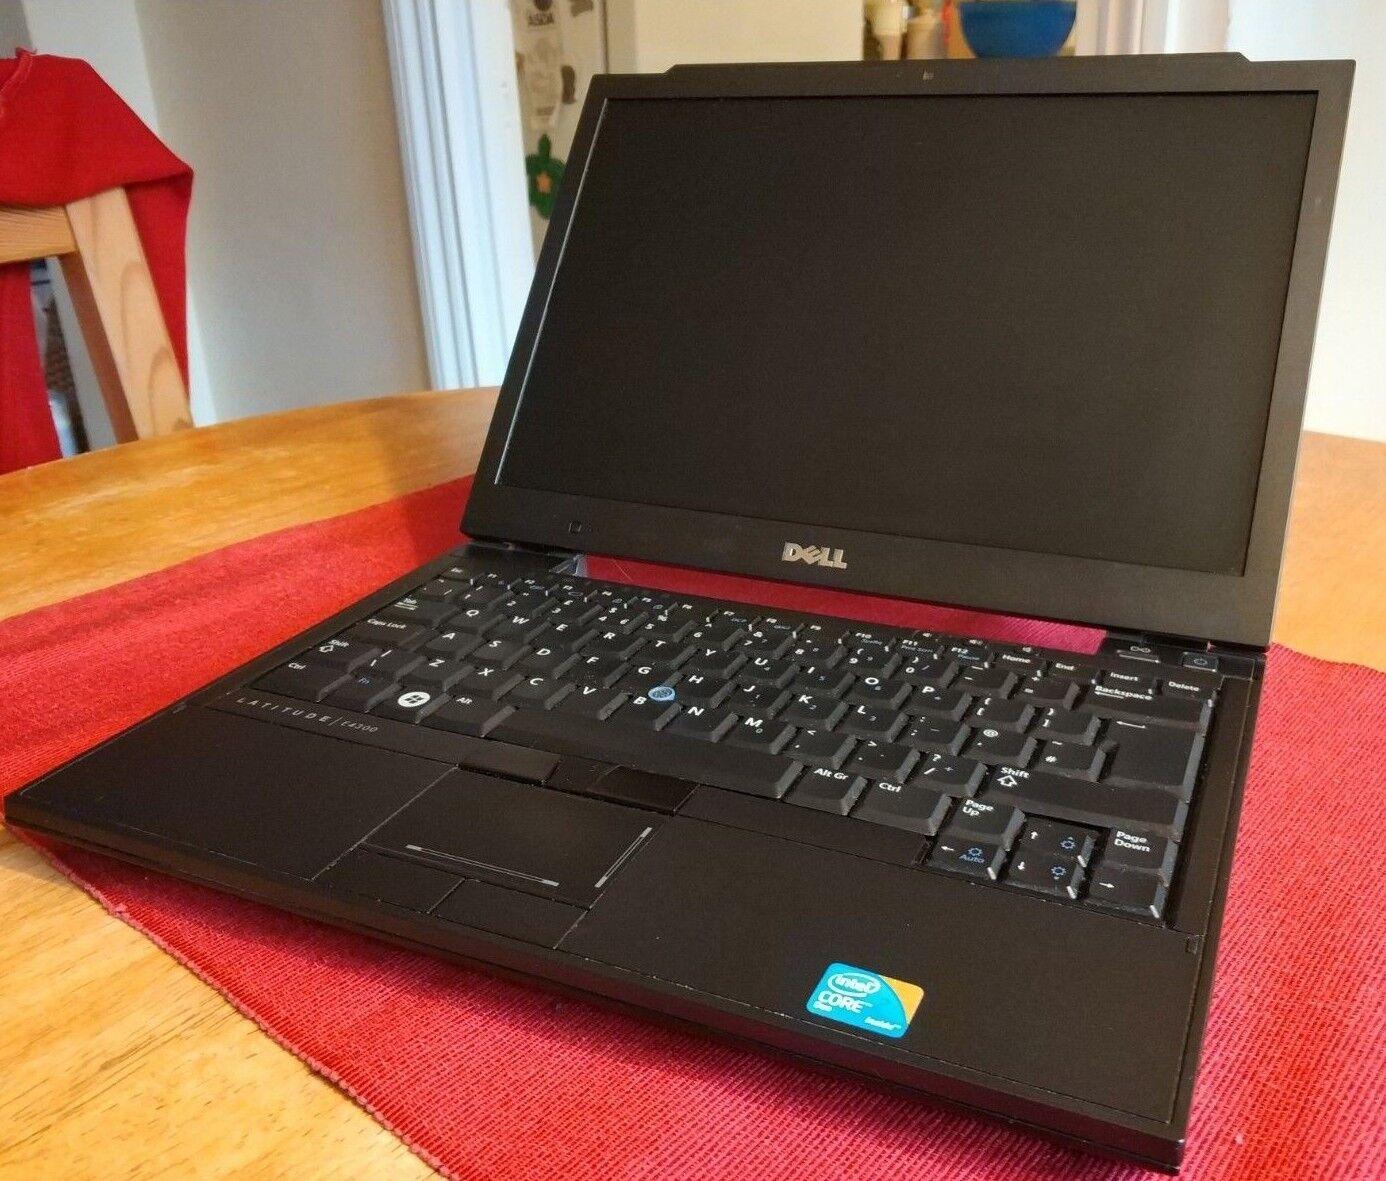 Laptop Windows - Dell Latitude E4300 Laptop - Windows 10 - 250GB HDD - 4GB Ram